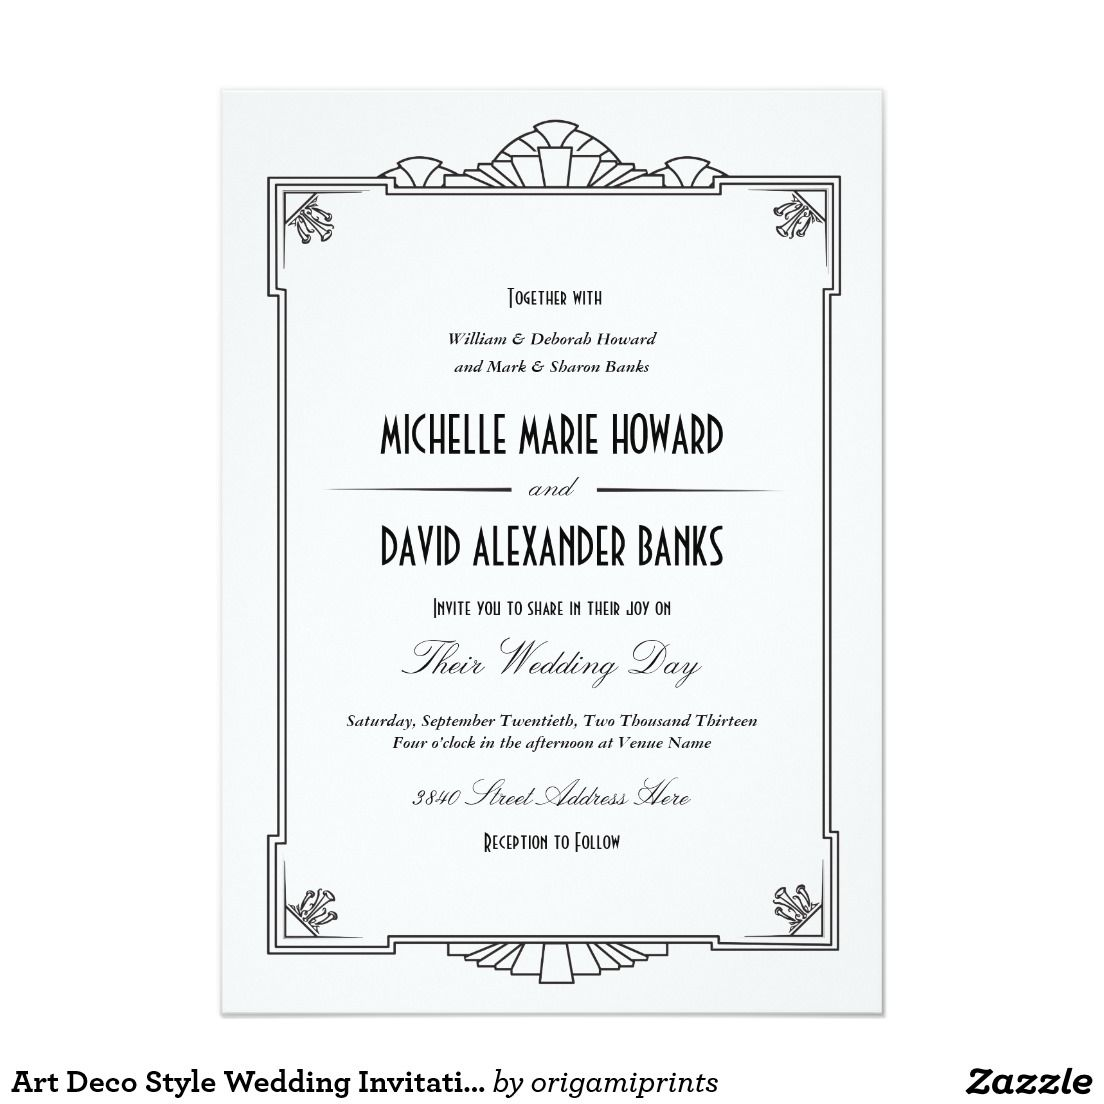 Art Deco Style Wedding Invitation | Art deco style weddings, Art ...